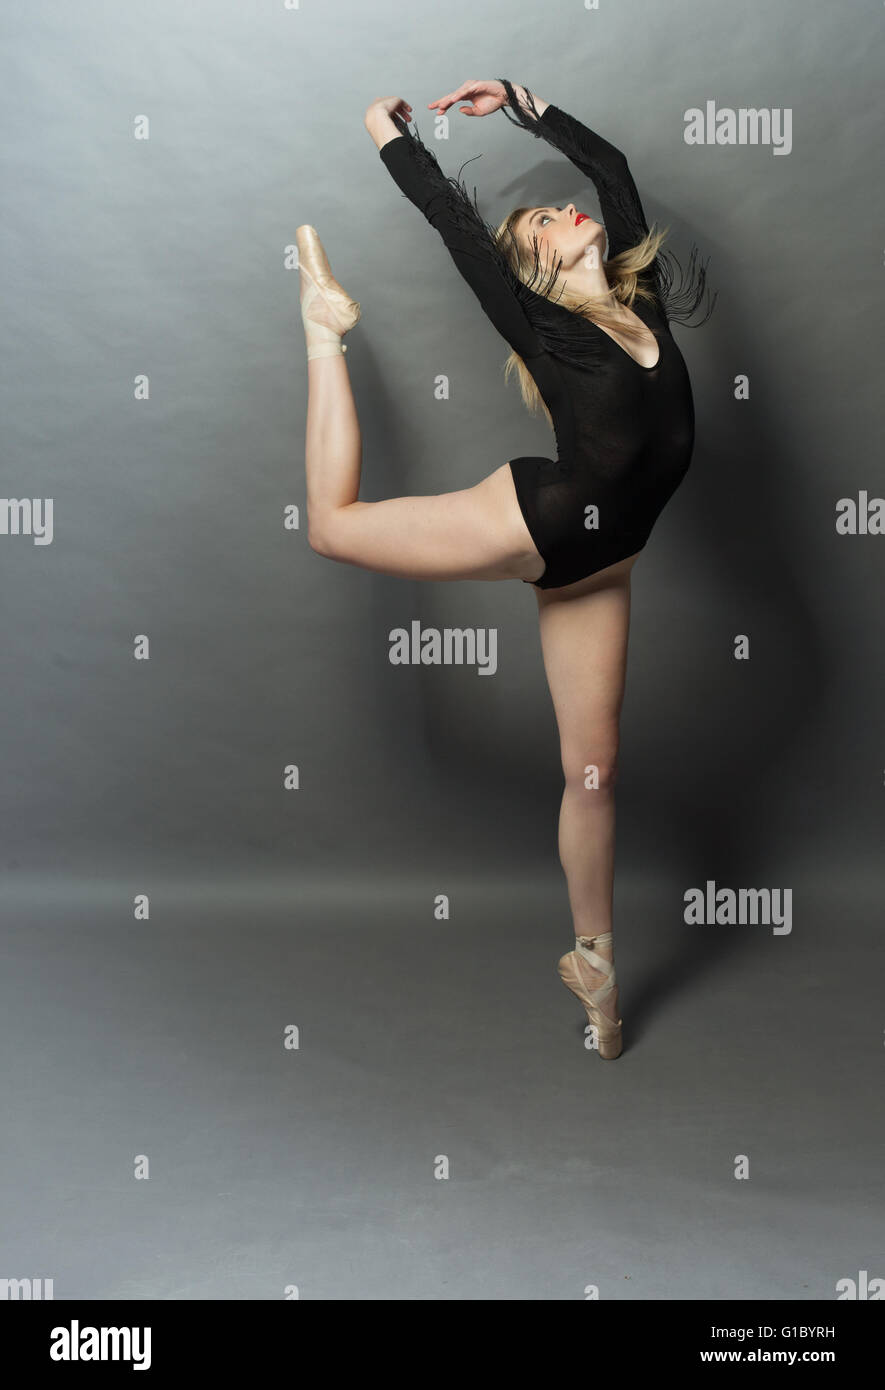 Bellissima ballerina facendo un arabesco Immagini Stock